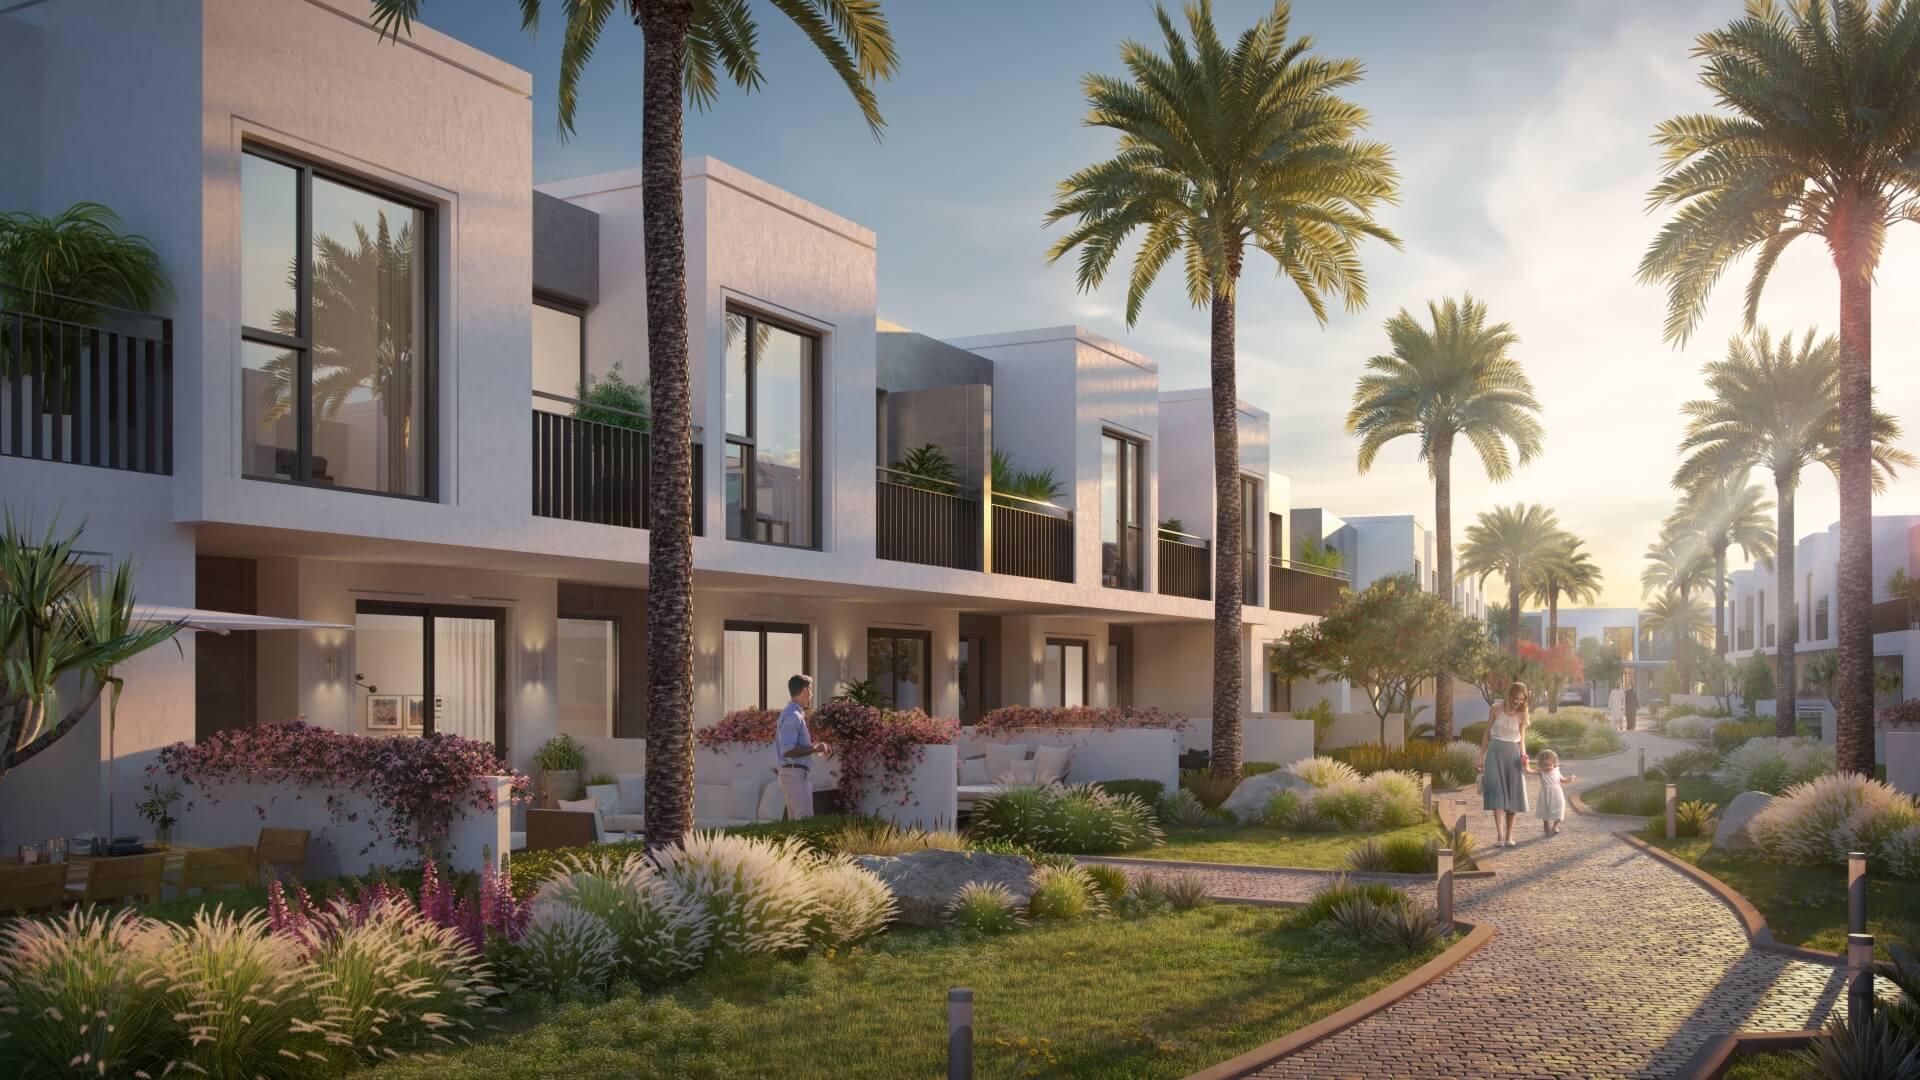 EXPO GOLF, Dubai South (Dubai World Central), UAE – photo 3